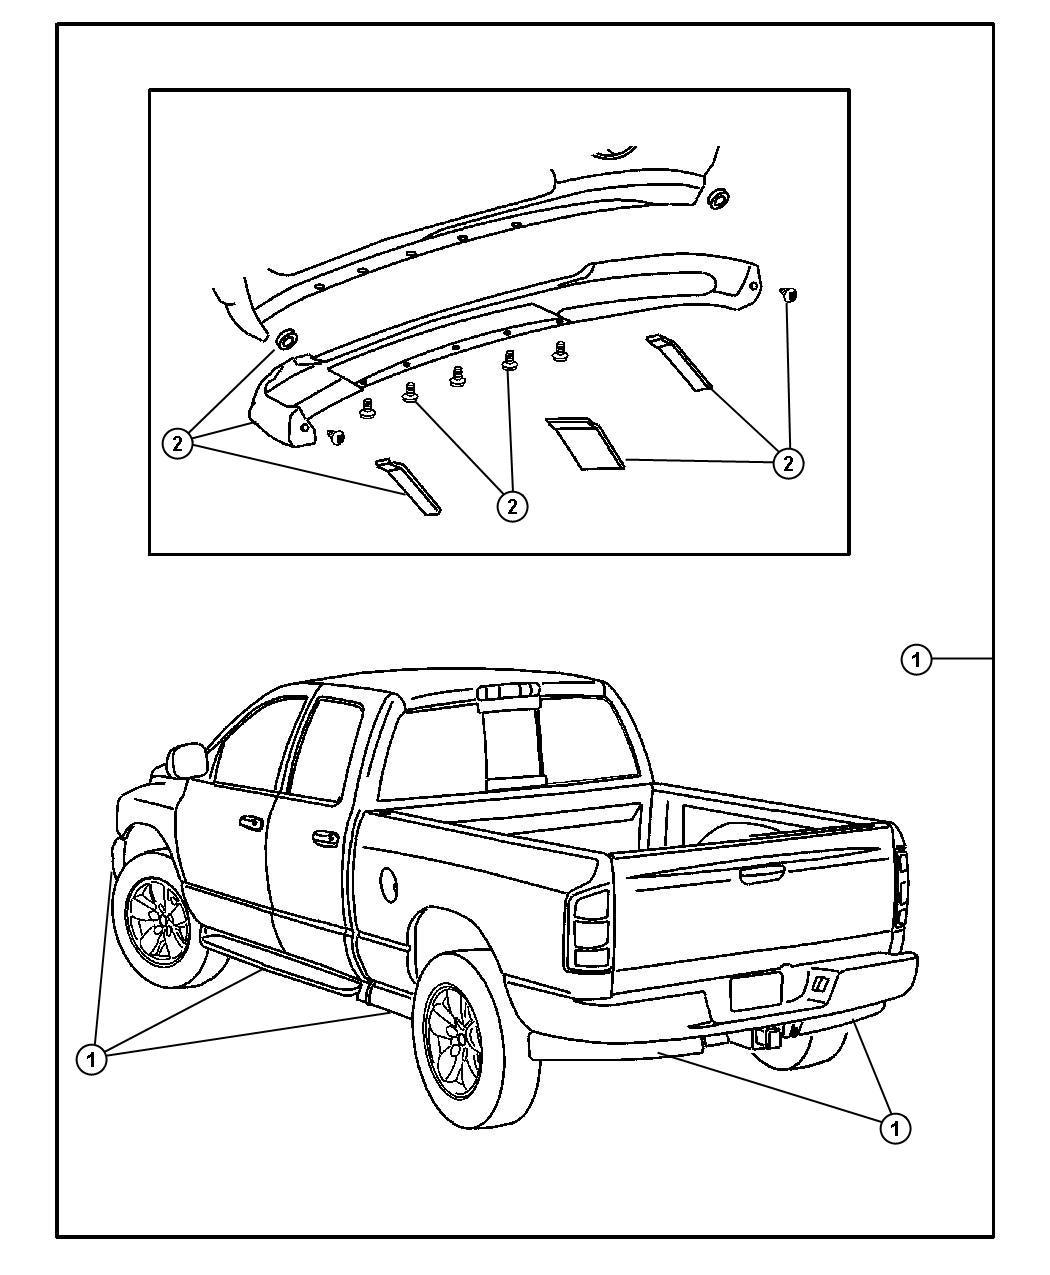 Dodge Ram 1500 Accent kit. Running board. Bright silver